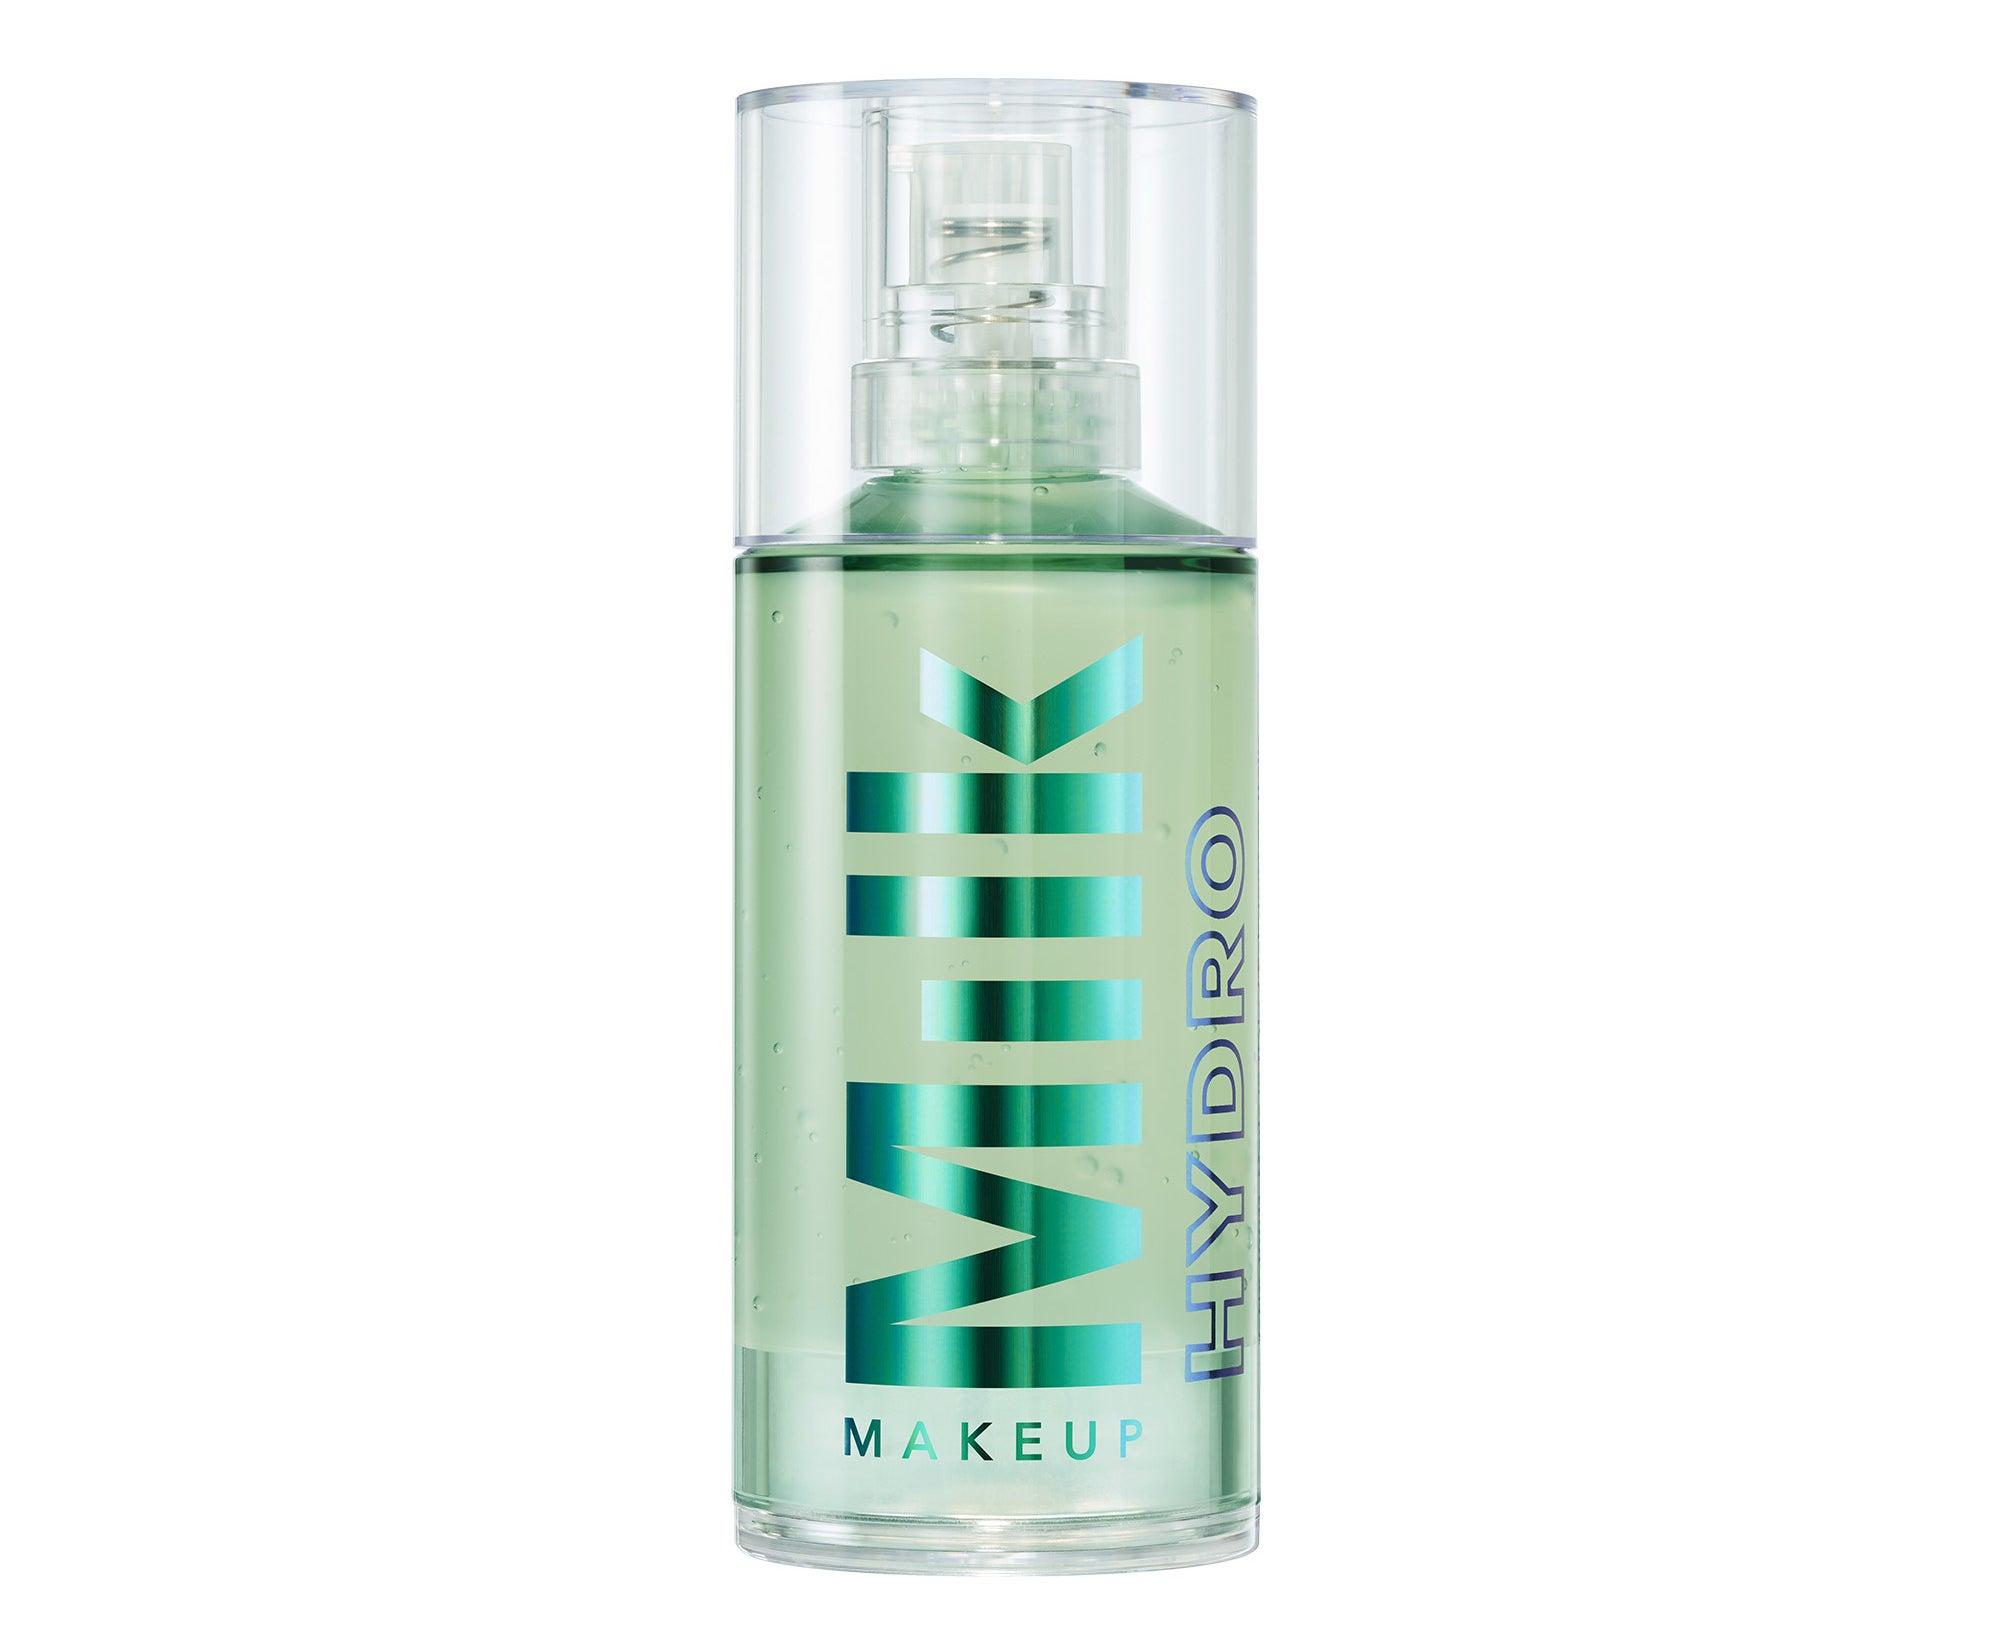 The milk makeup hydro grip primer